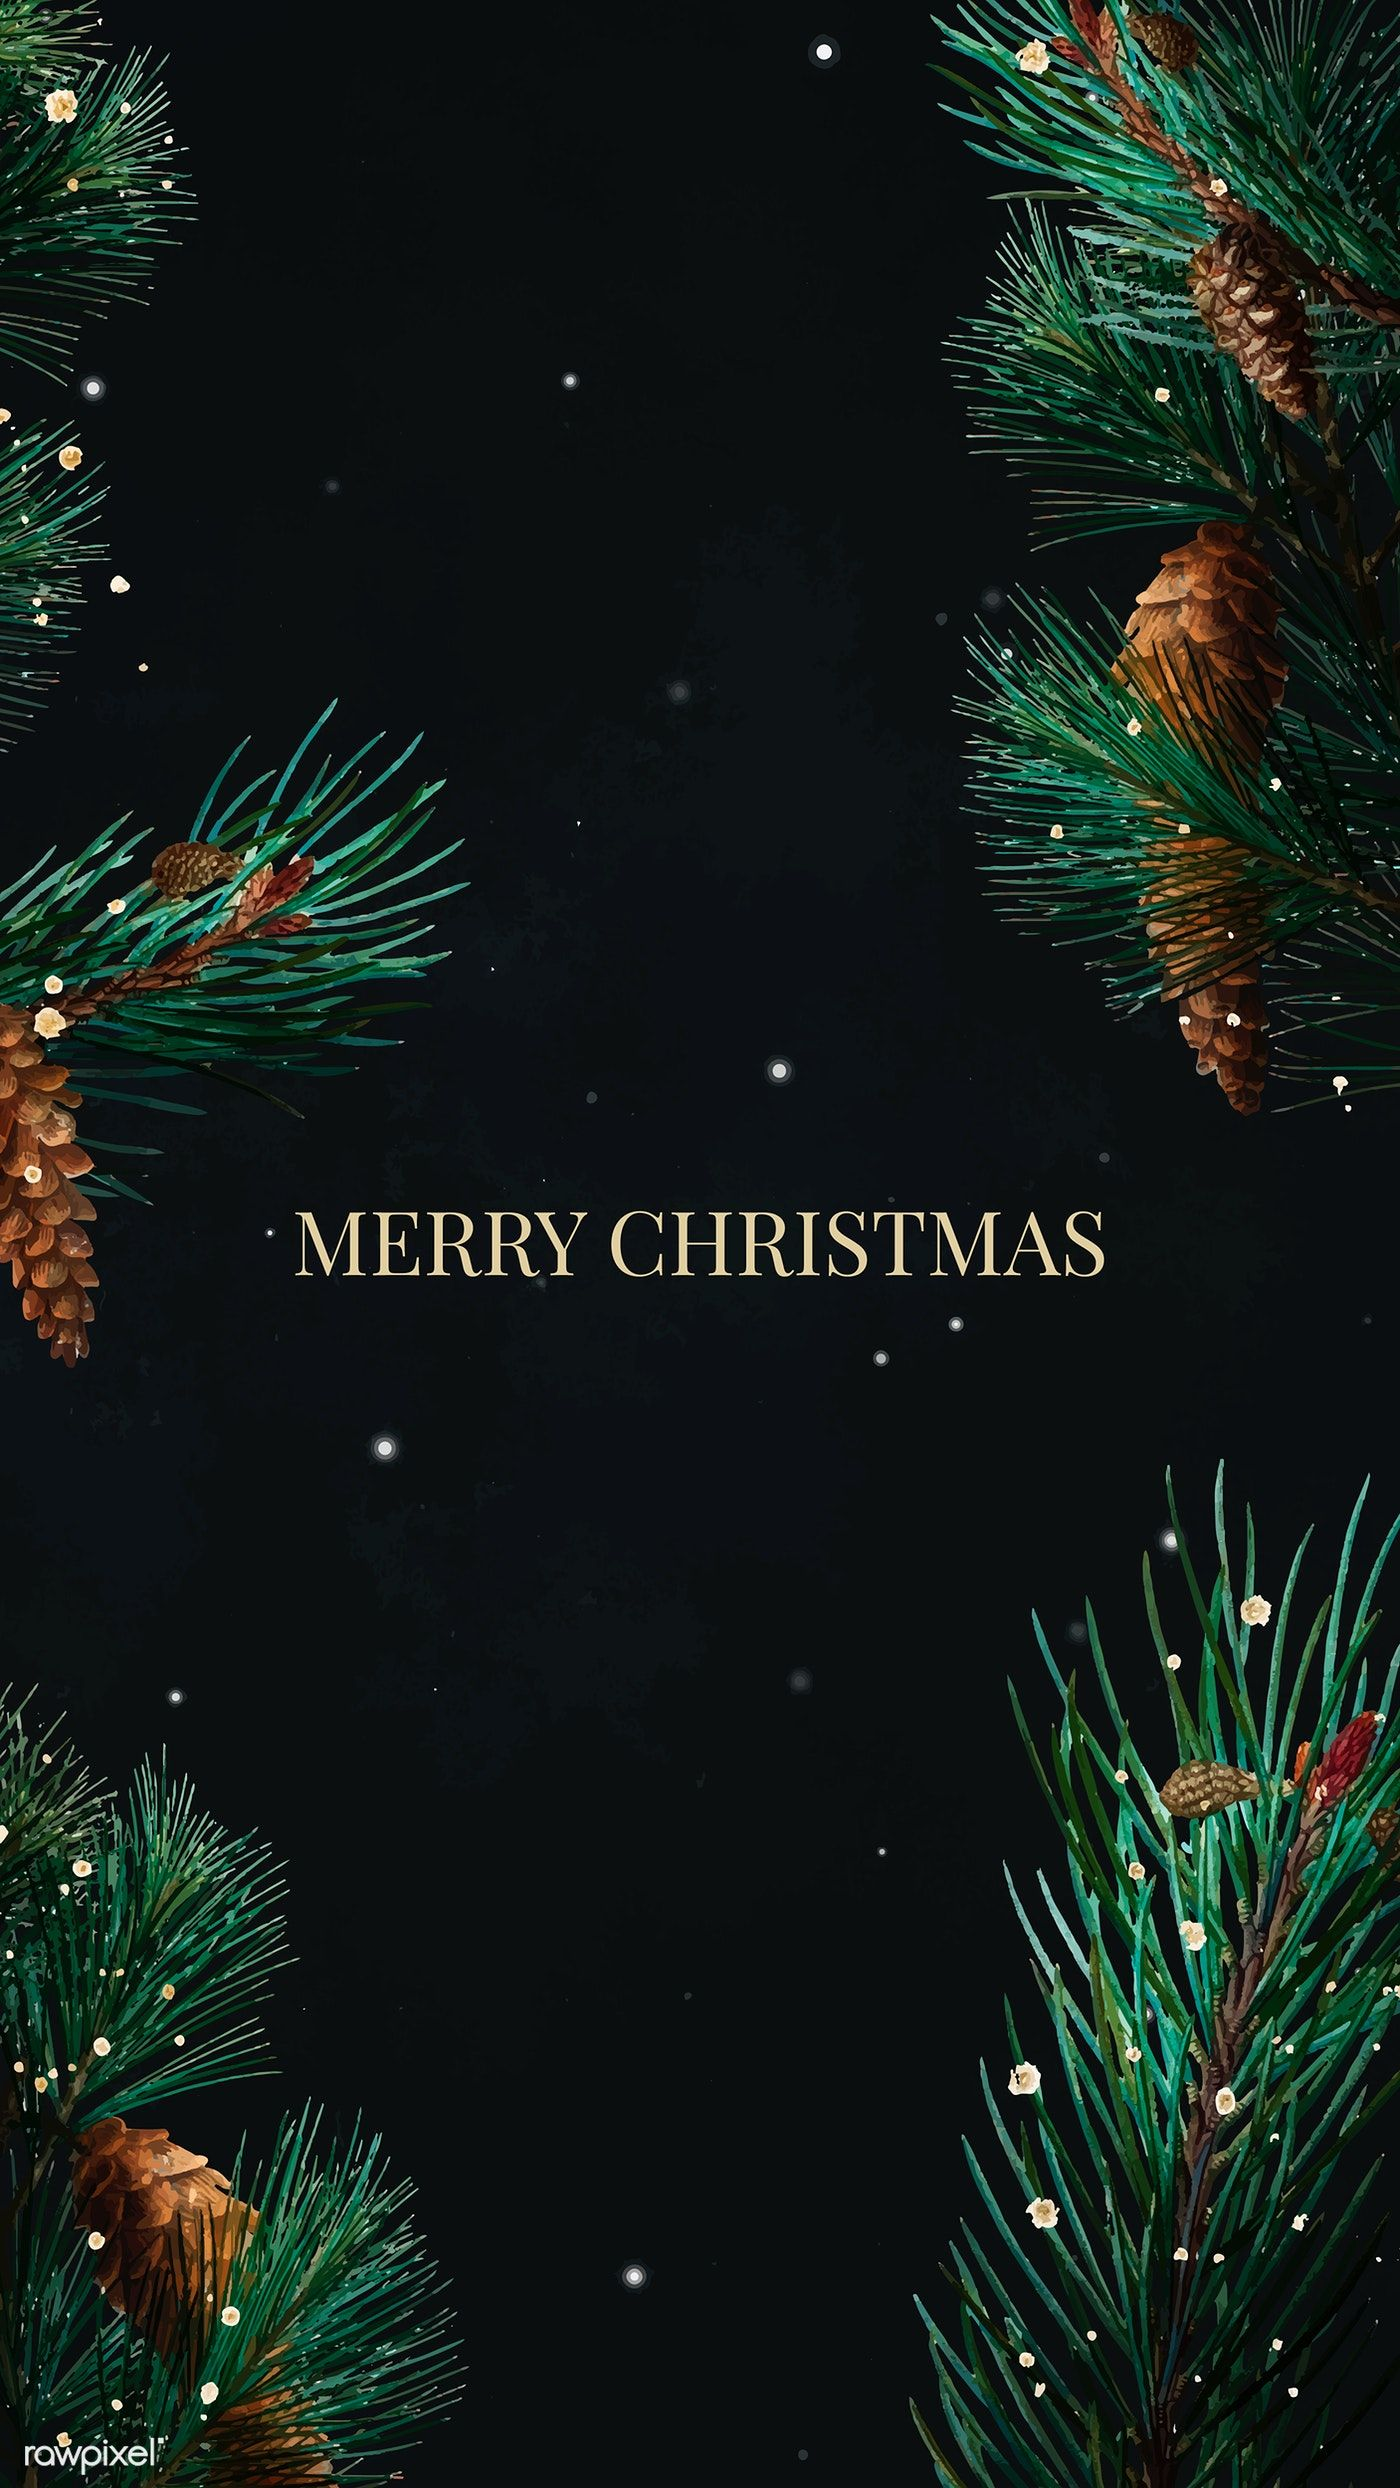 Download Premium Vector Of Fesitve Merry Christmas Mobile Wallpaper Vector Merry Christmas Wallpaper Christmas Wallpaper Christmas Wallpaper Hd